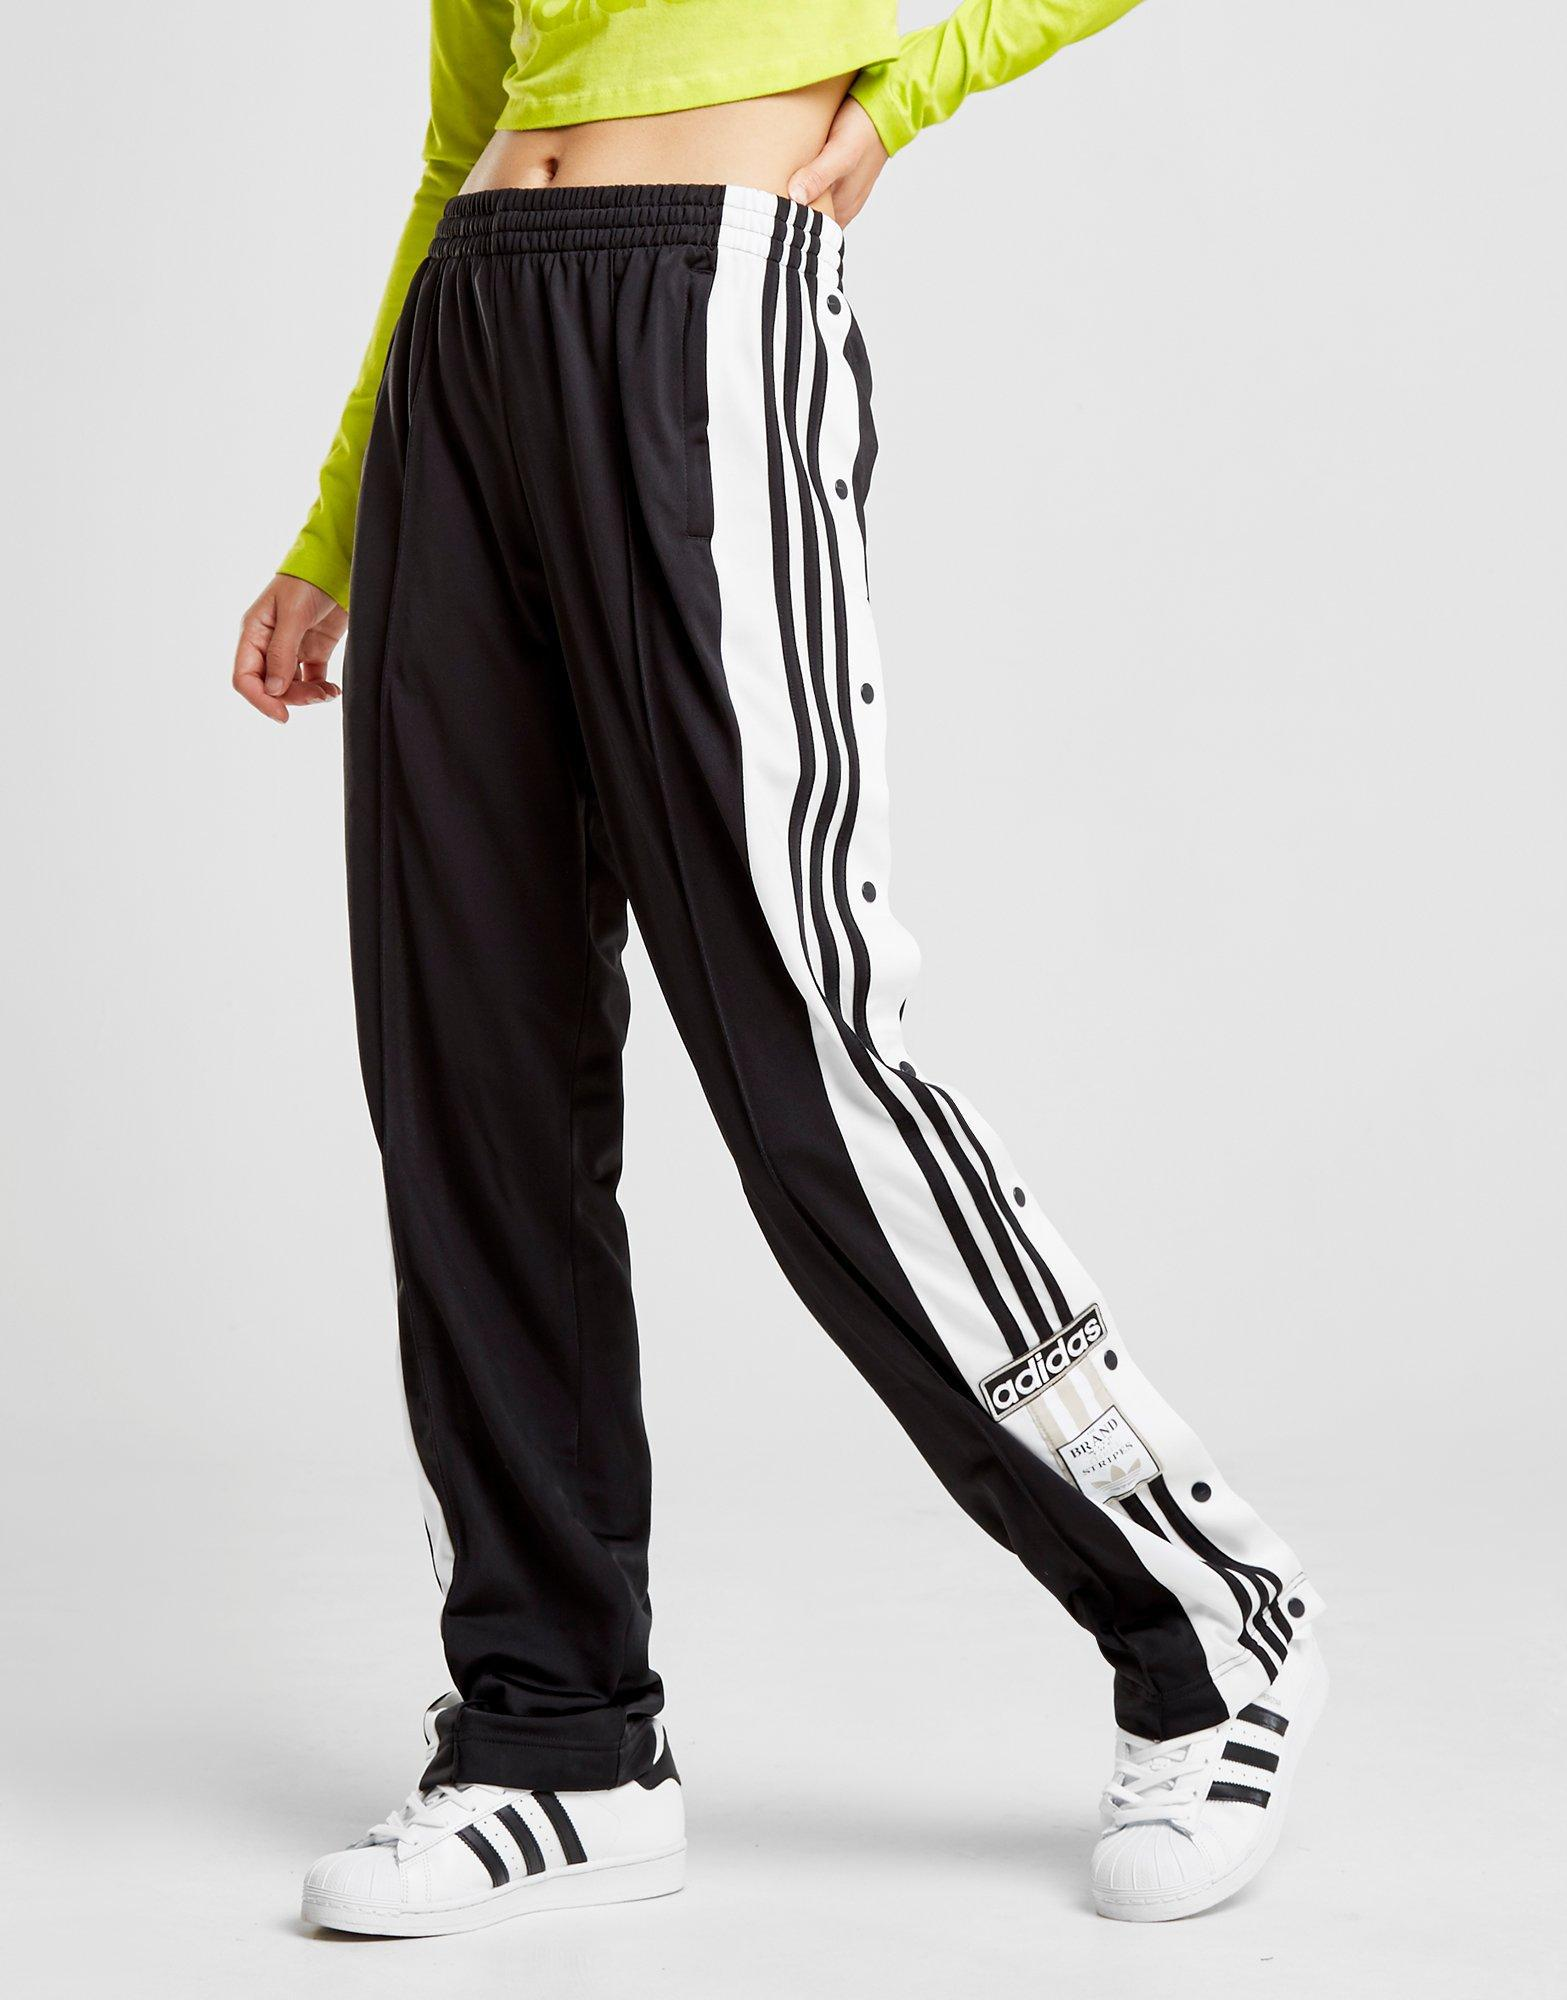 High Quality Adidas Originals Adibreak Popper Pants